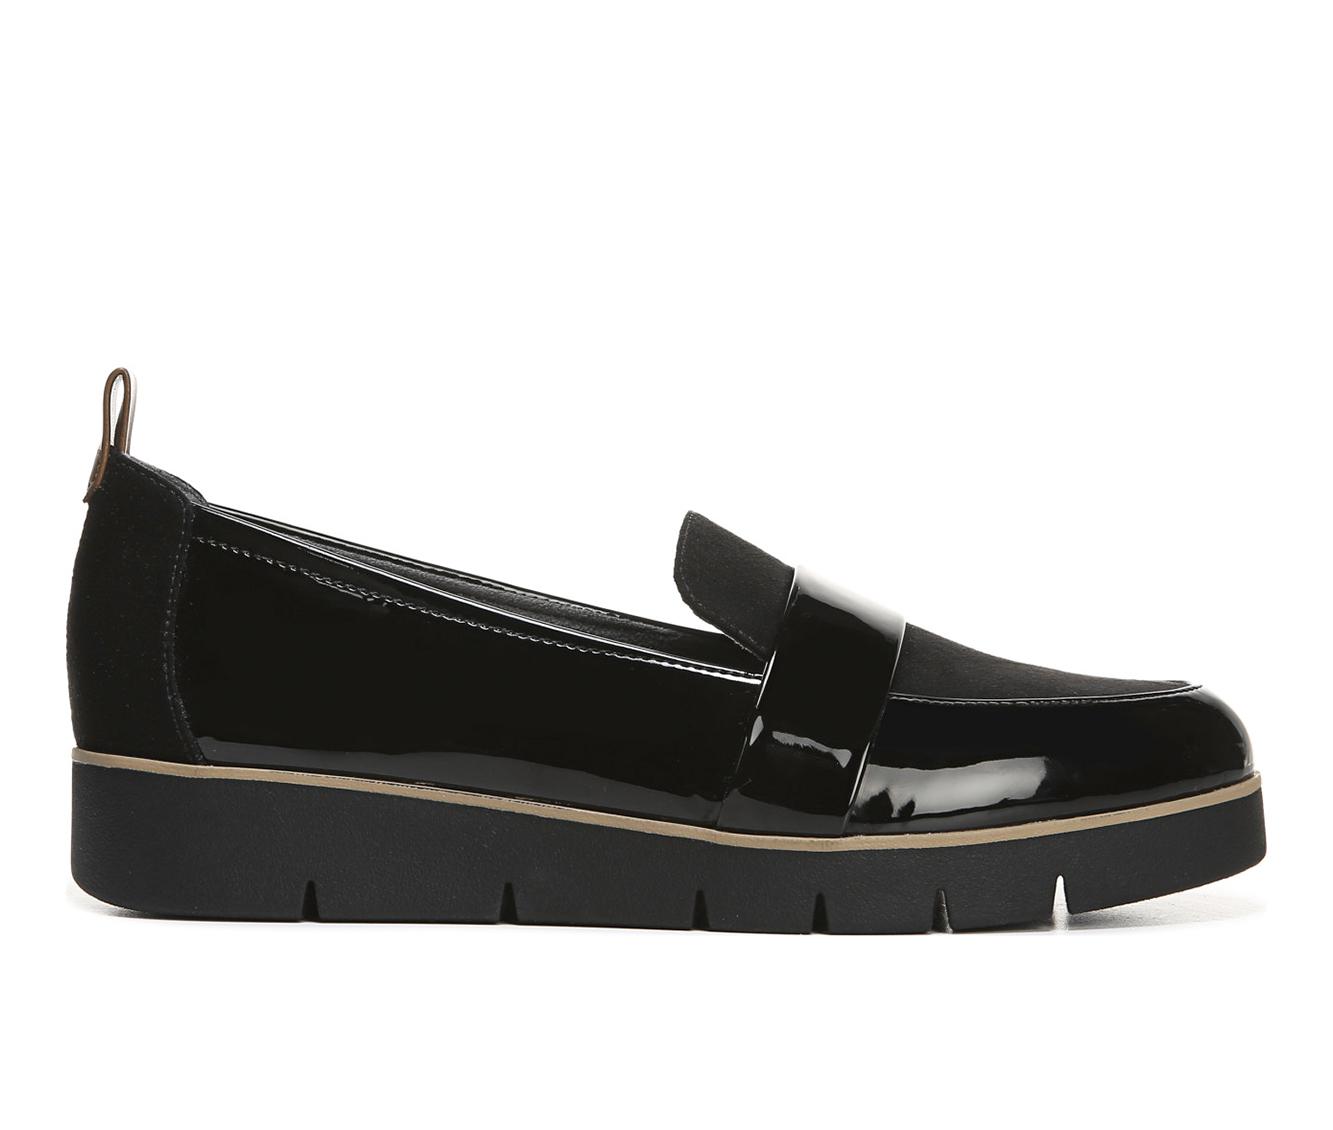 Dr. Scholls Webster Women's Shoe (Black Faux Leather)